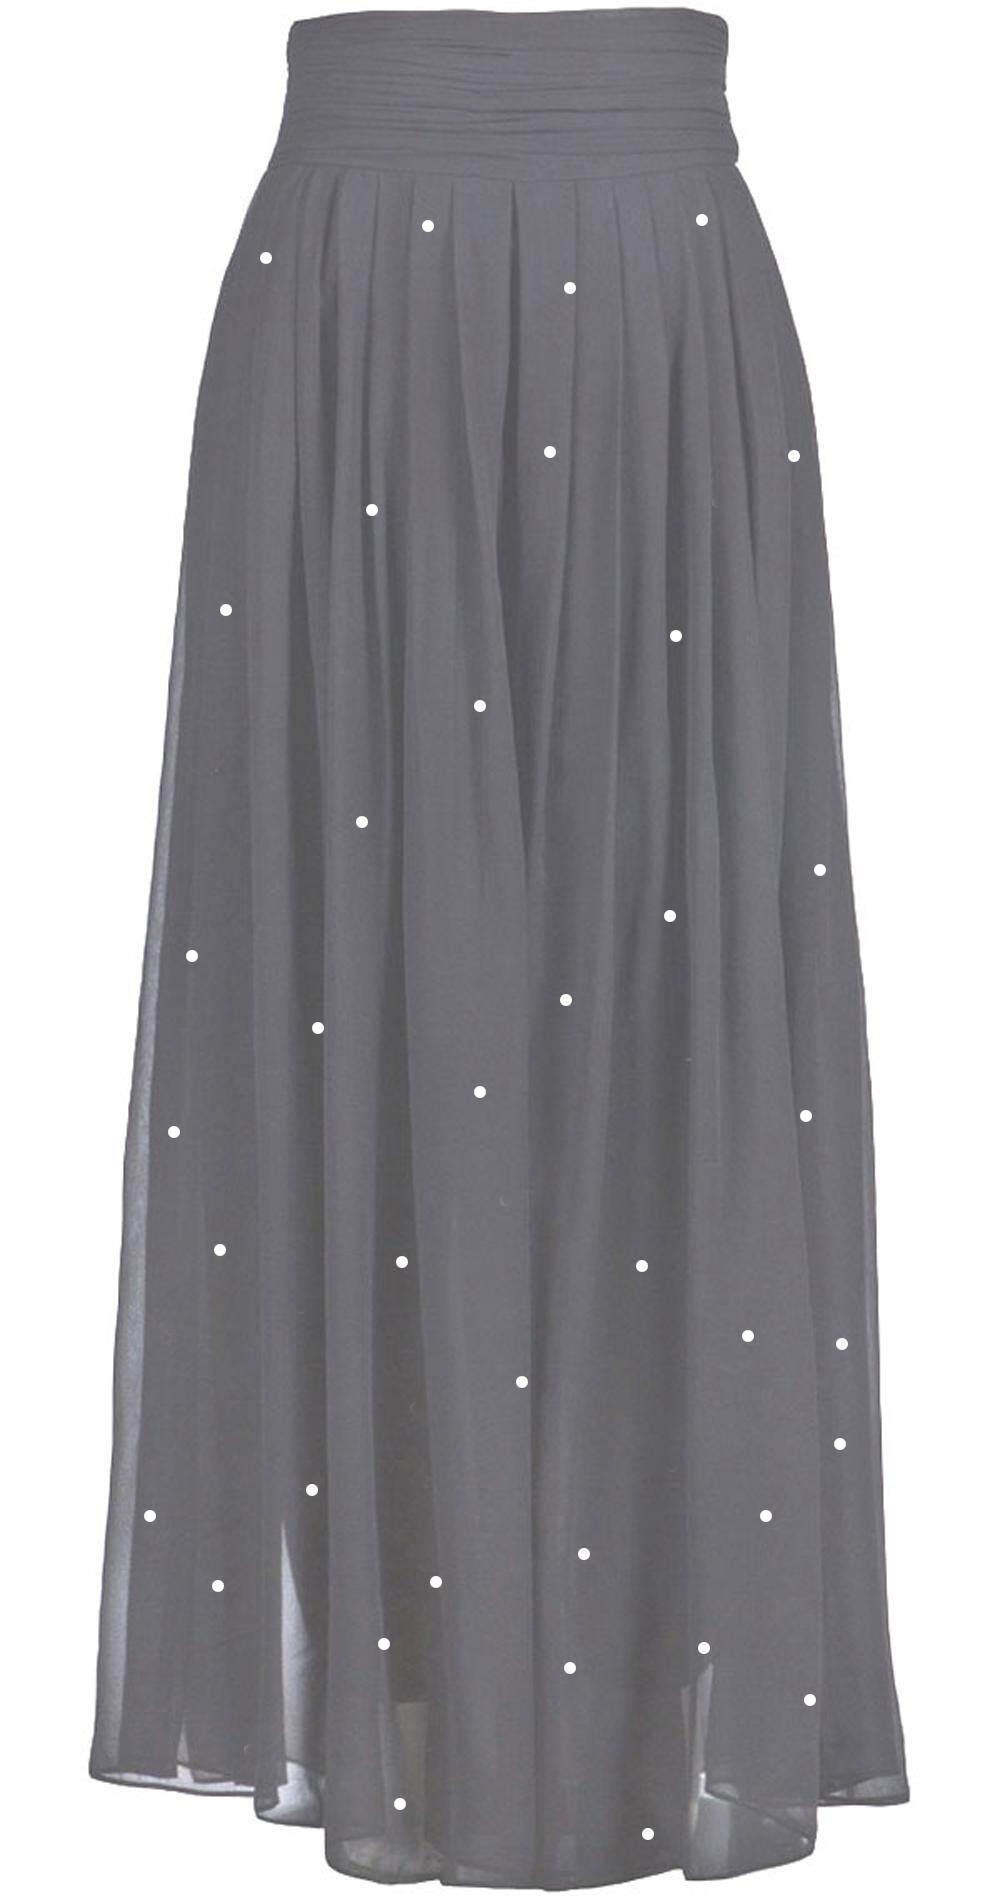 Crystal Chiffon Skirt For Muslimah - Starlet Chiffon